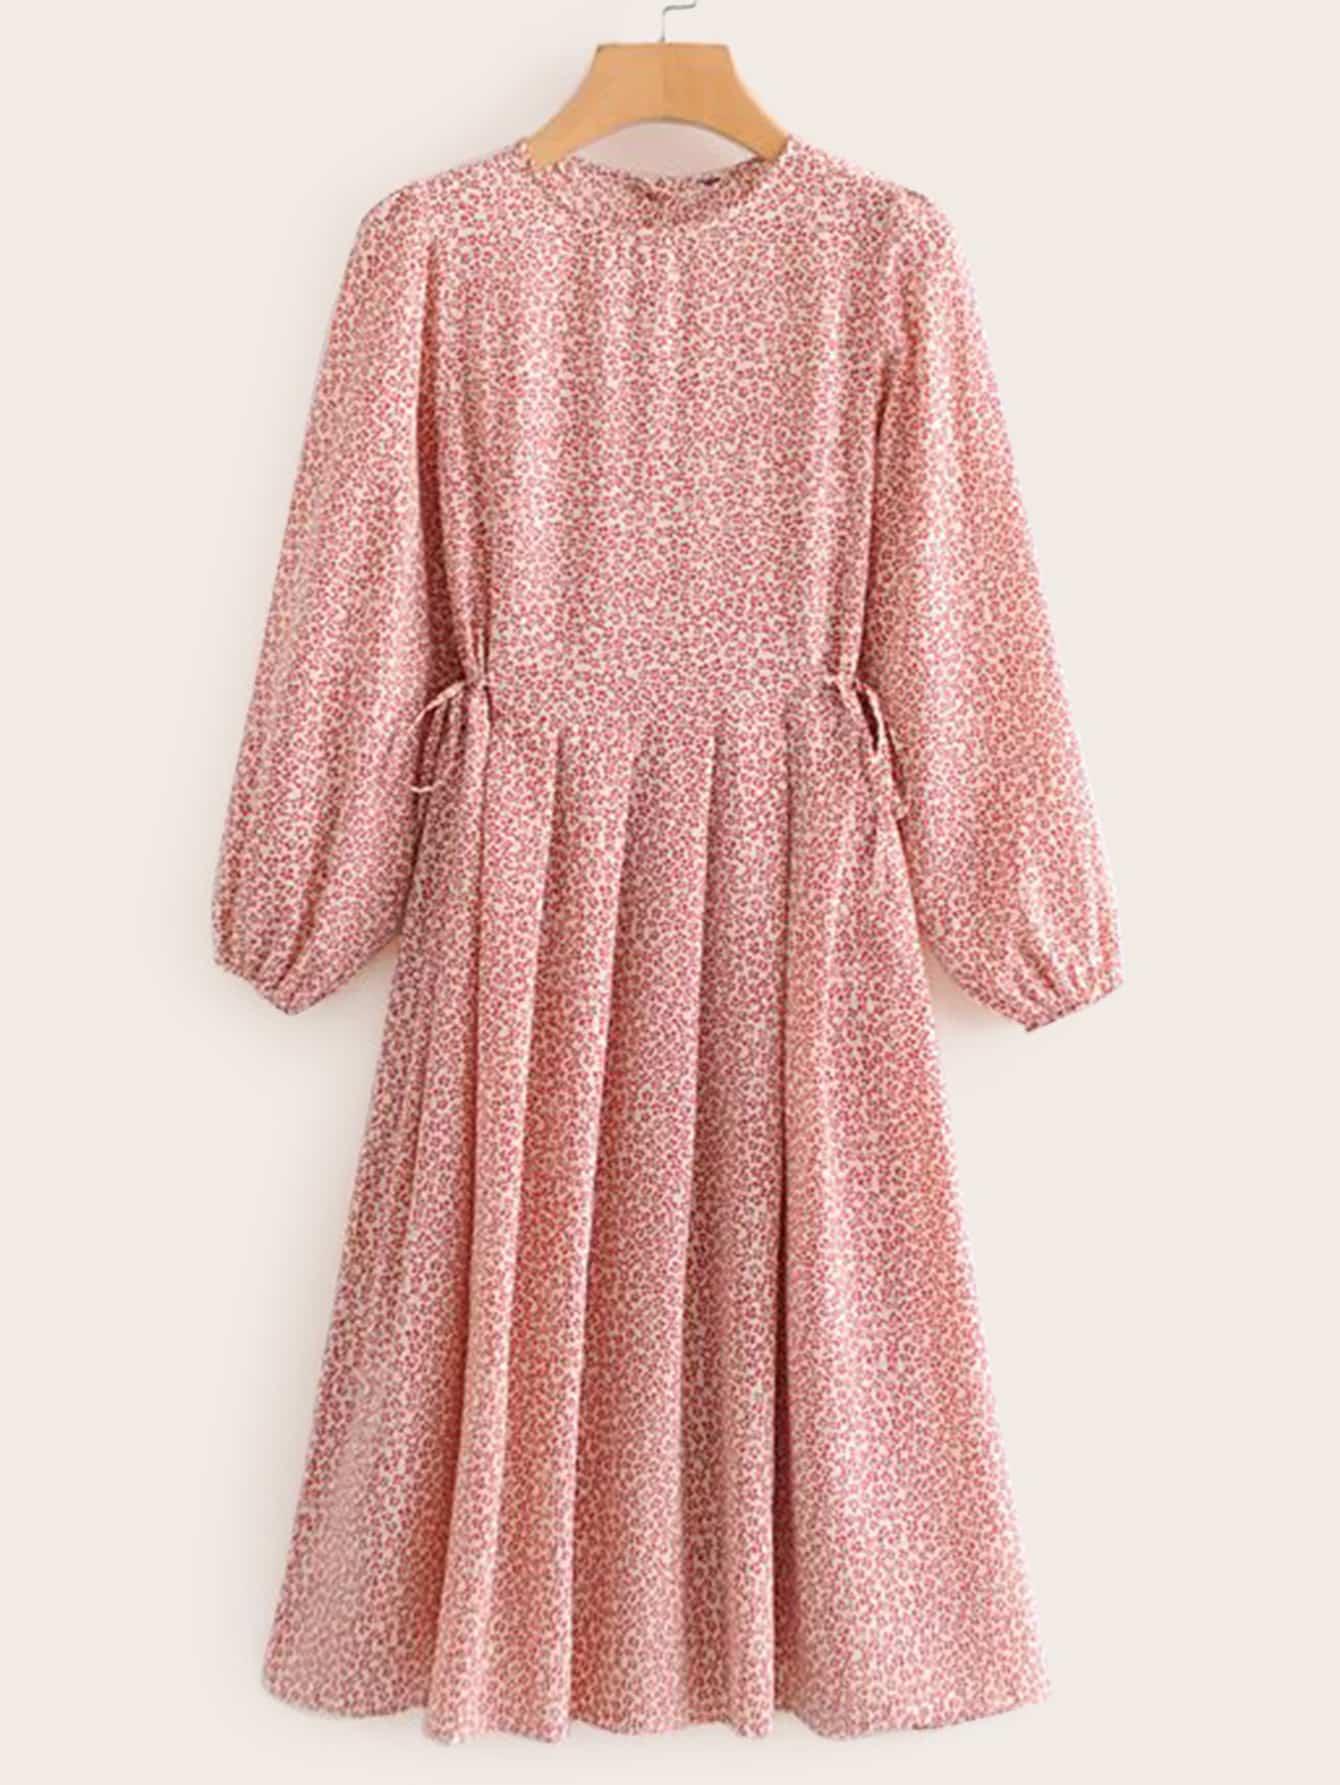 7f6e5c6586 Ditsy Floral Print Drawstring Waist Frill Trim Skirt купить в Краснодаре